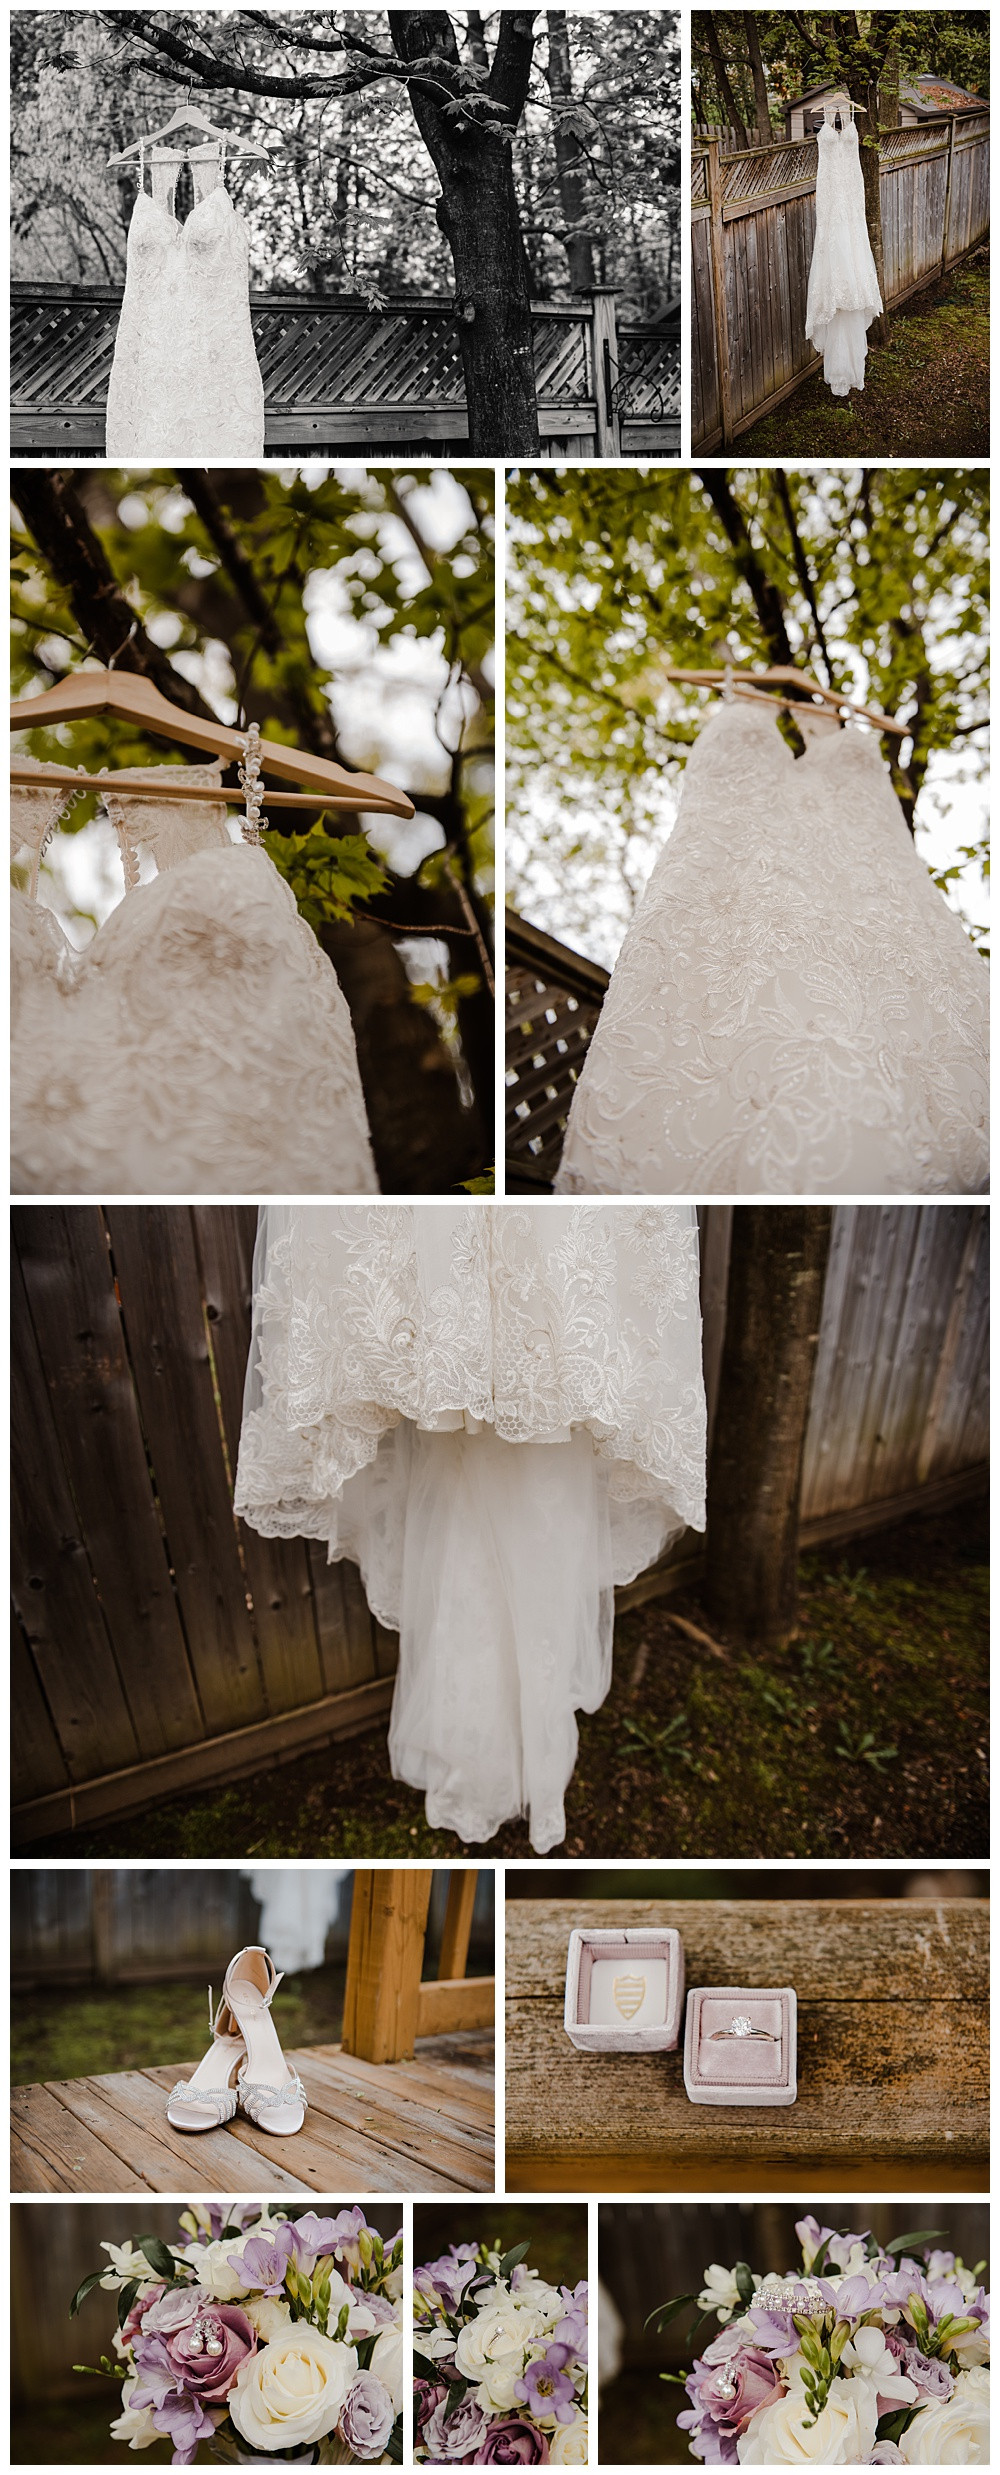 Wedding Dress, Wedding Shoes, Wedding Flowers, Wedding Rings, Wedding Jewellery, Detail Shots